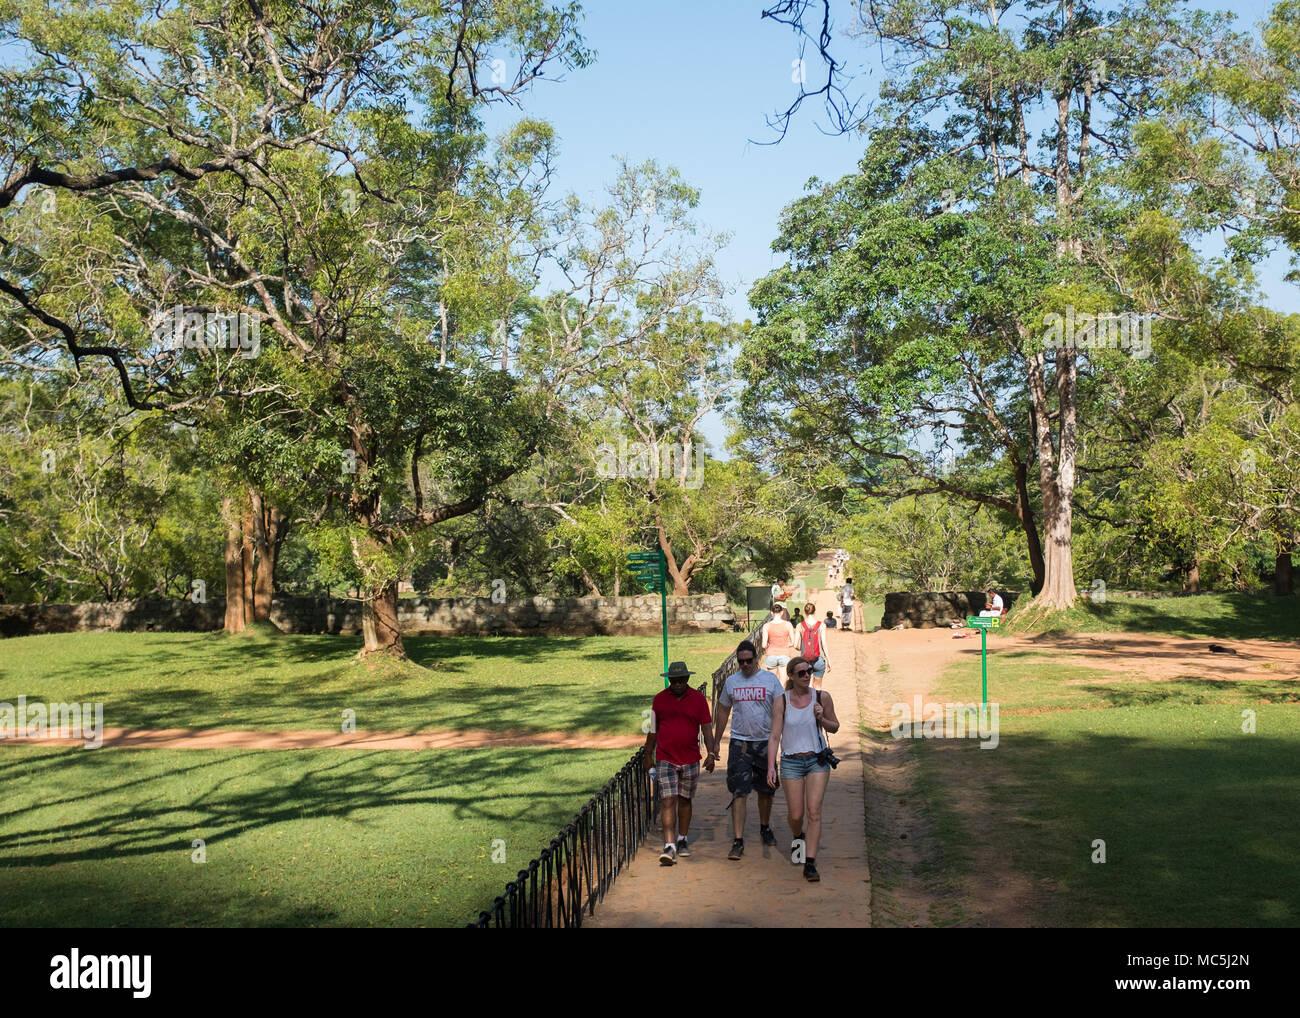 Tourists on the way to Sigiriya Rock Fortress (Lion Rock), UNESCO World Heritage Site, Sigiriya, Cultural Triangle - Stock Image